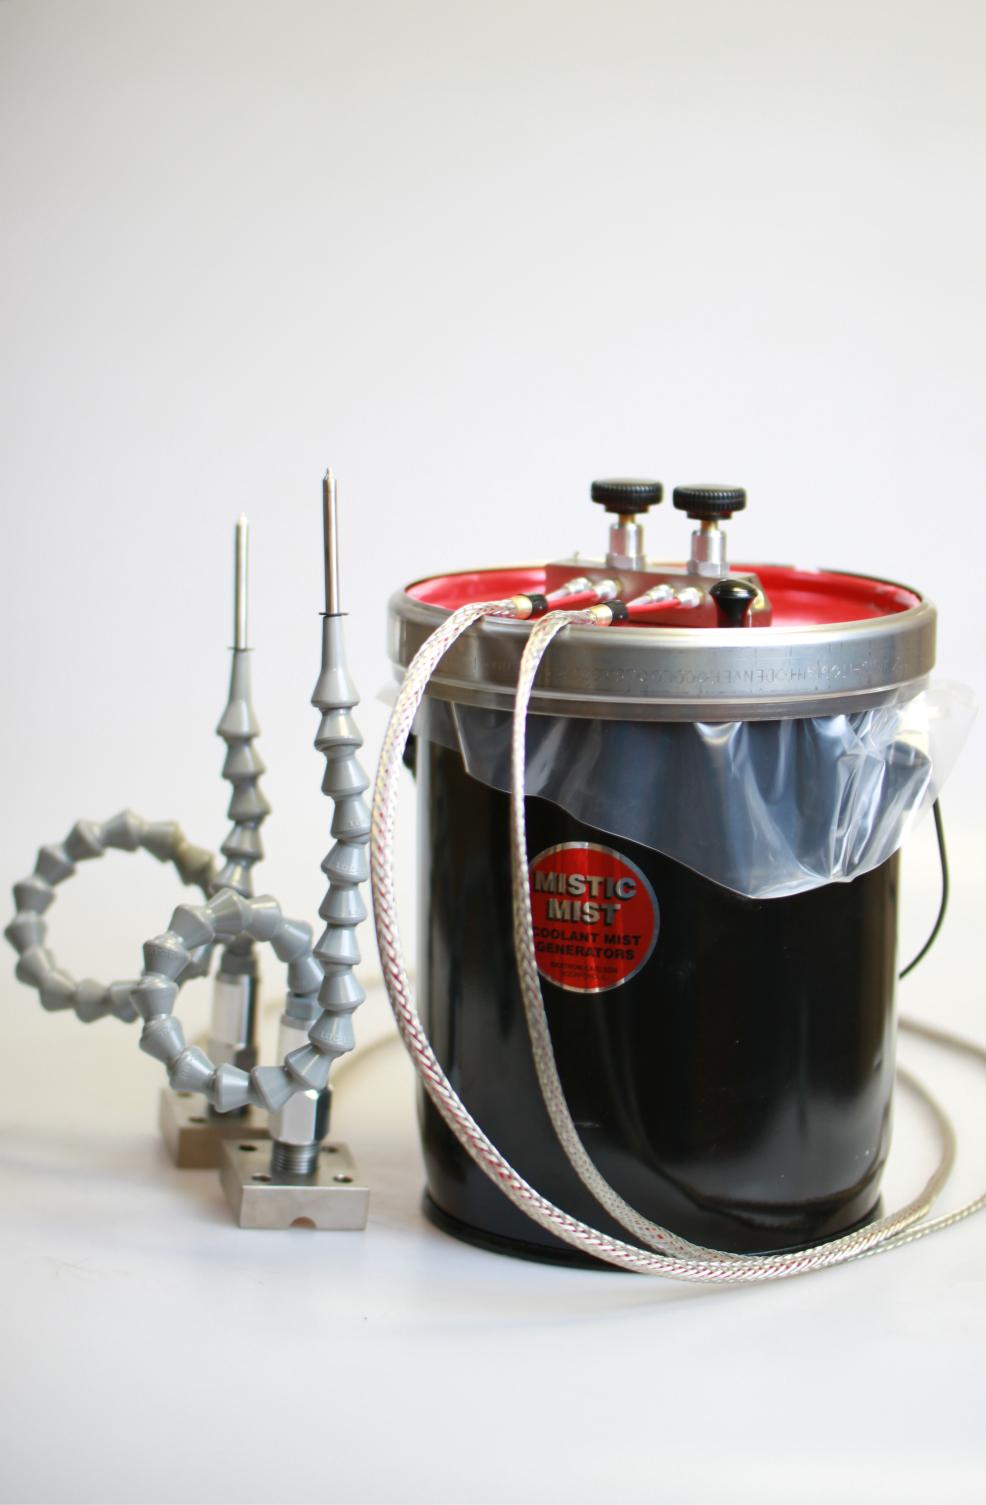 Cool Mist Coolant Tank System : Ekstrom carlson cooling mist spray system mistic